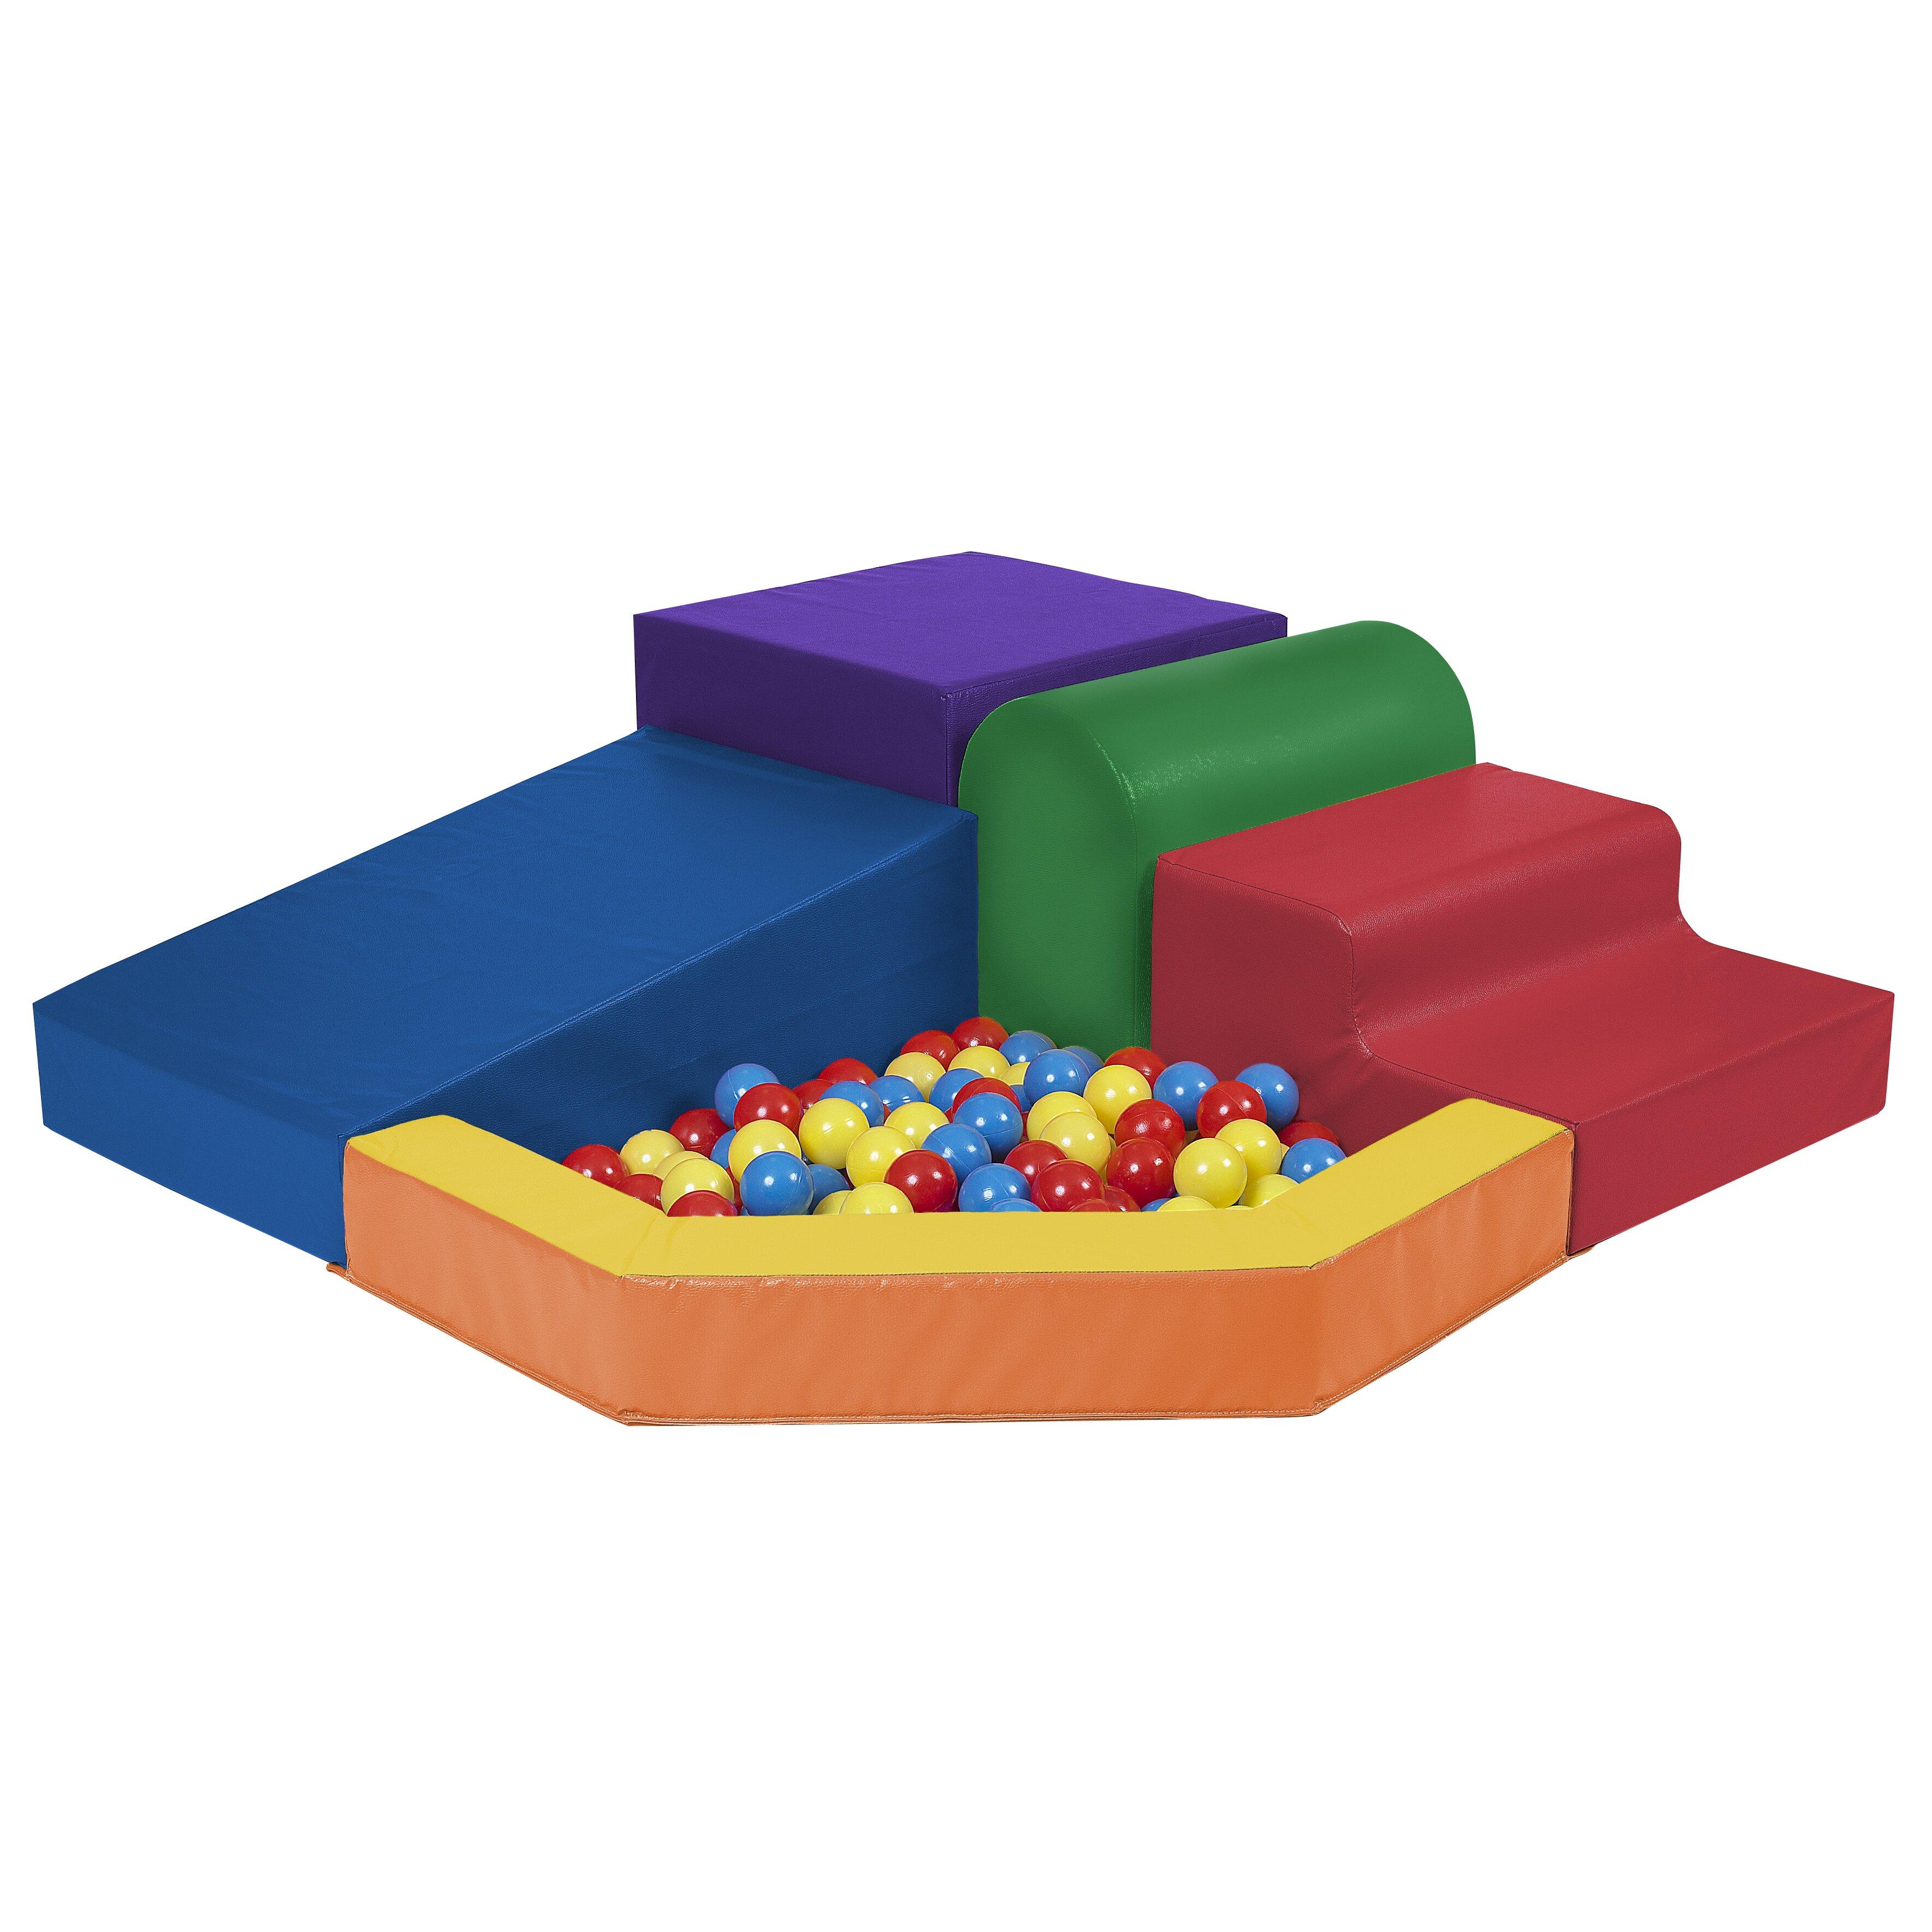 trade school options dell latitude item no gv commercial school furniture supplies soft play blocks mats